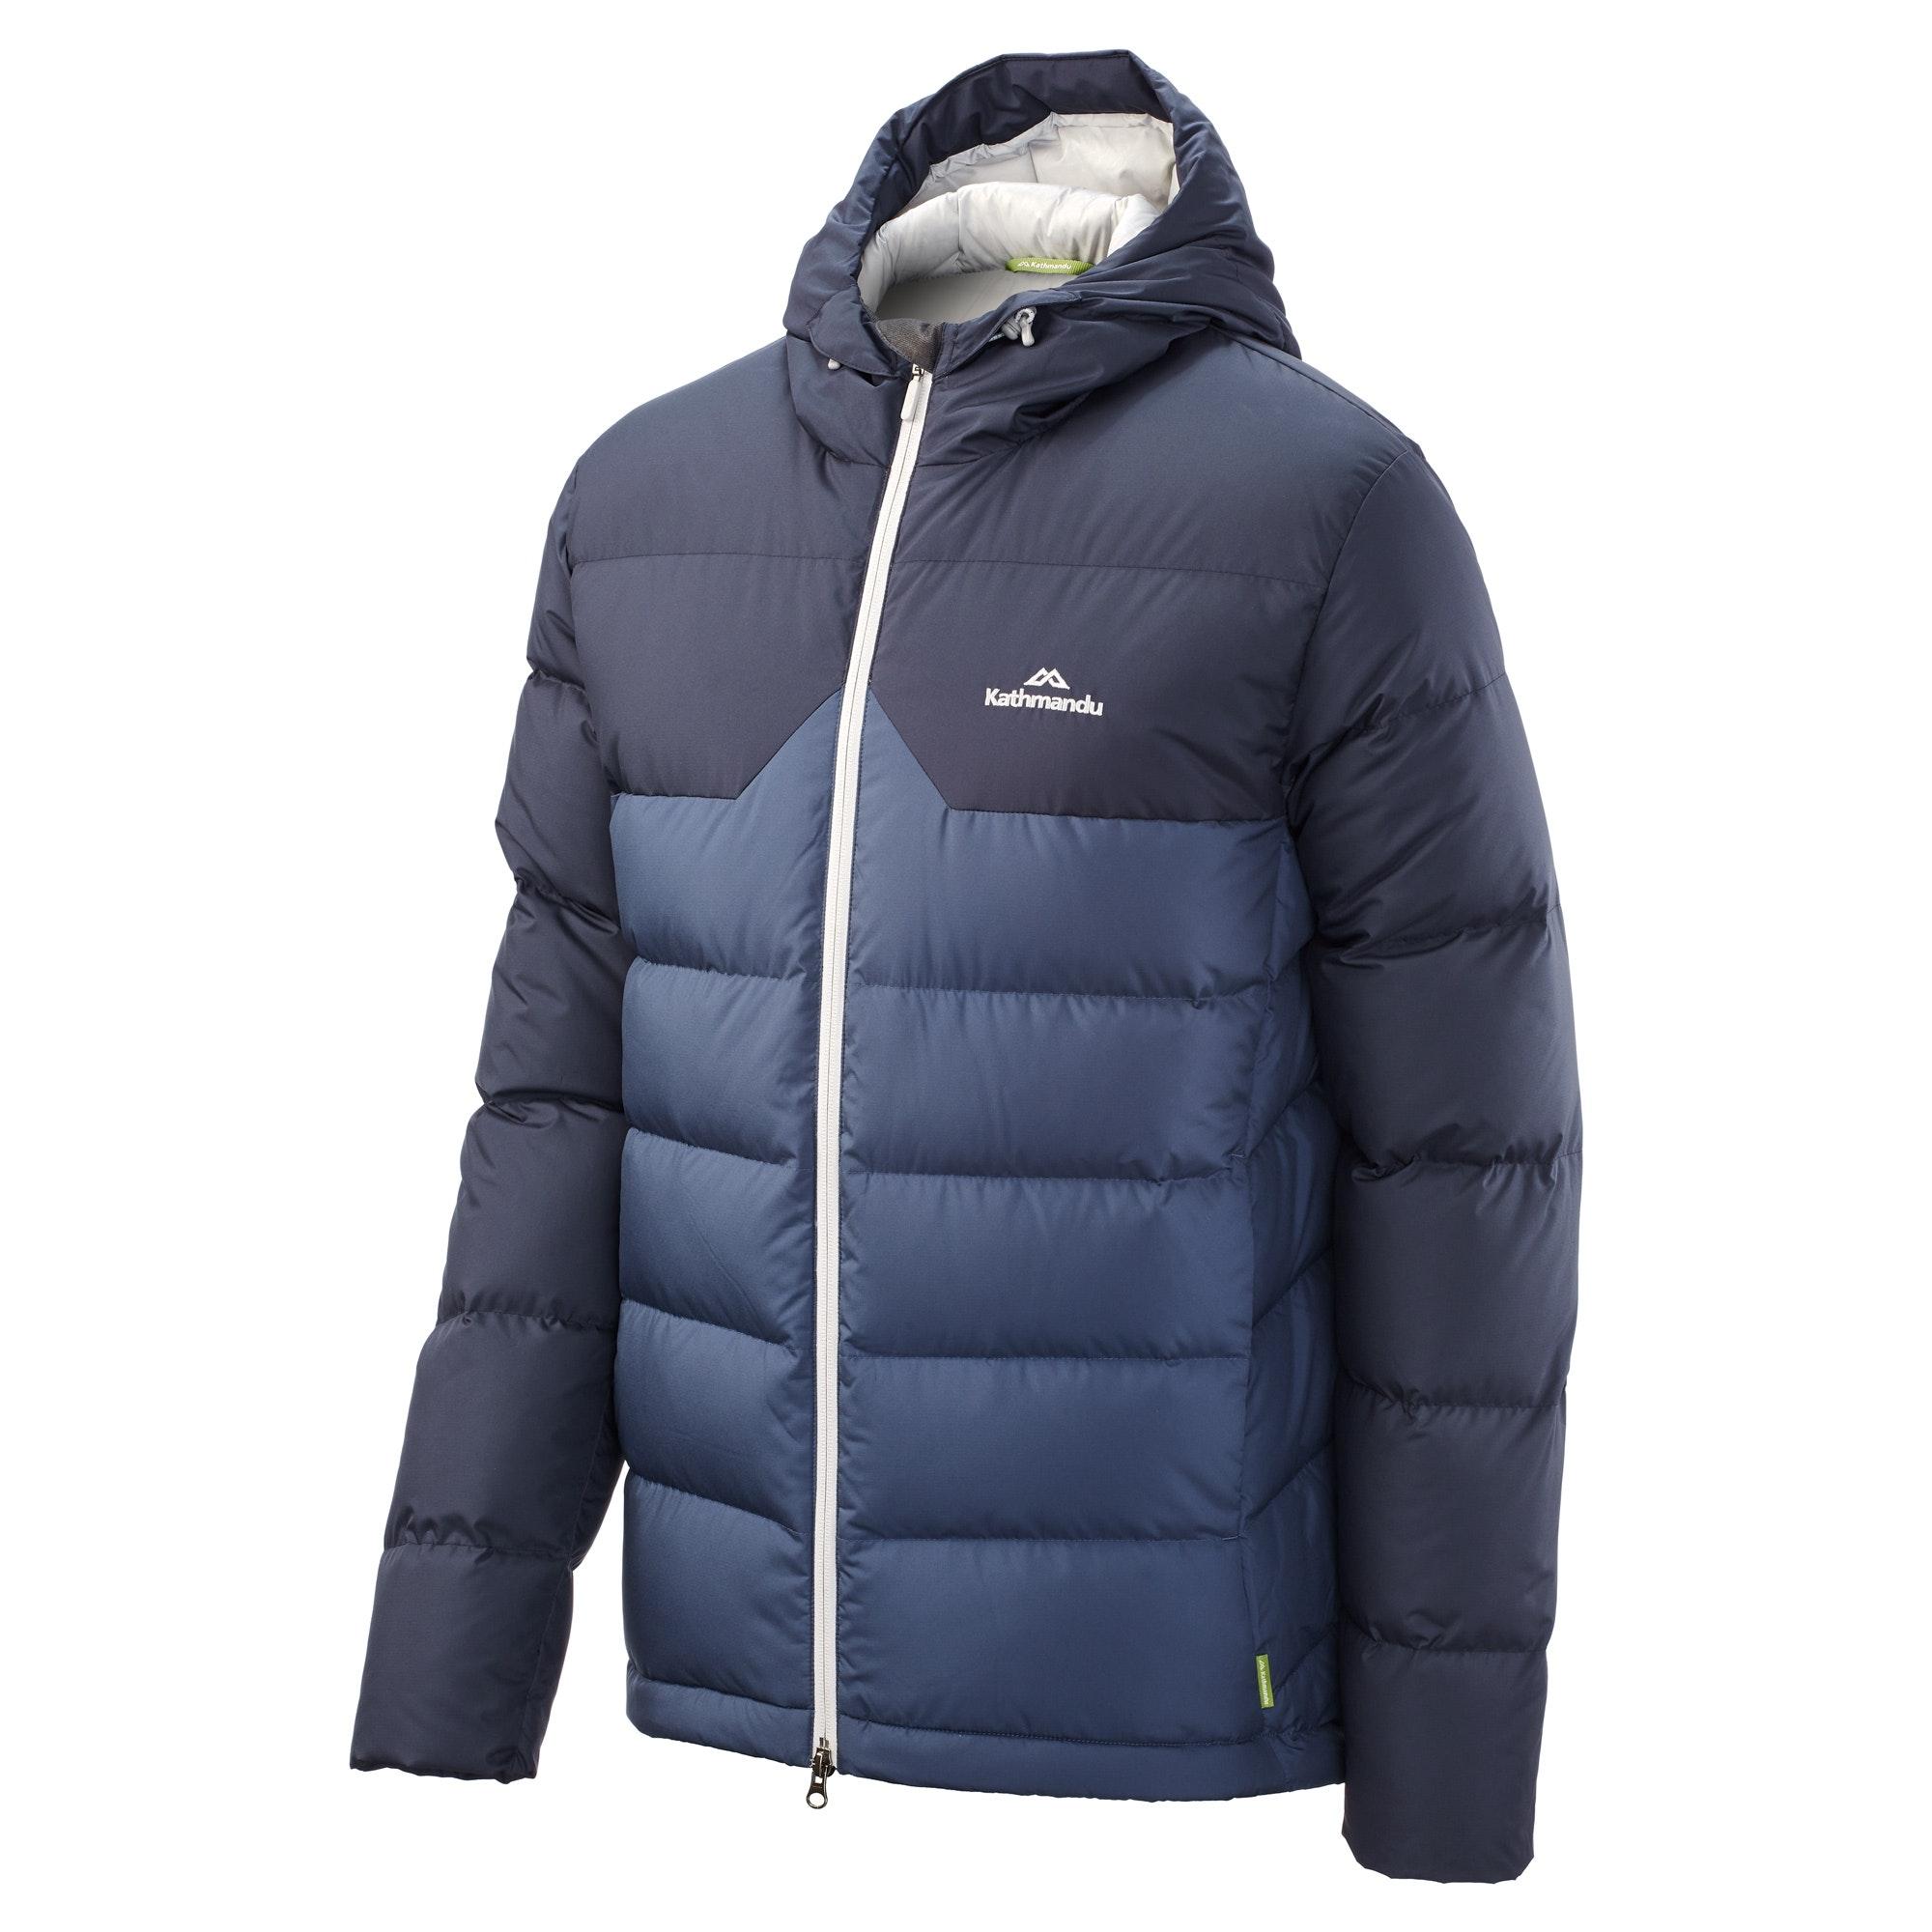 NEW-Kathmandu-Epiq-Men-039-s-Hooded-Warm-Winter-Duck-Down-Puffer-Jacket-v2